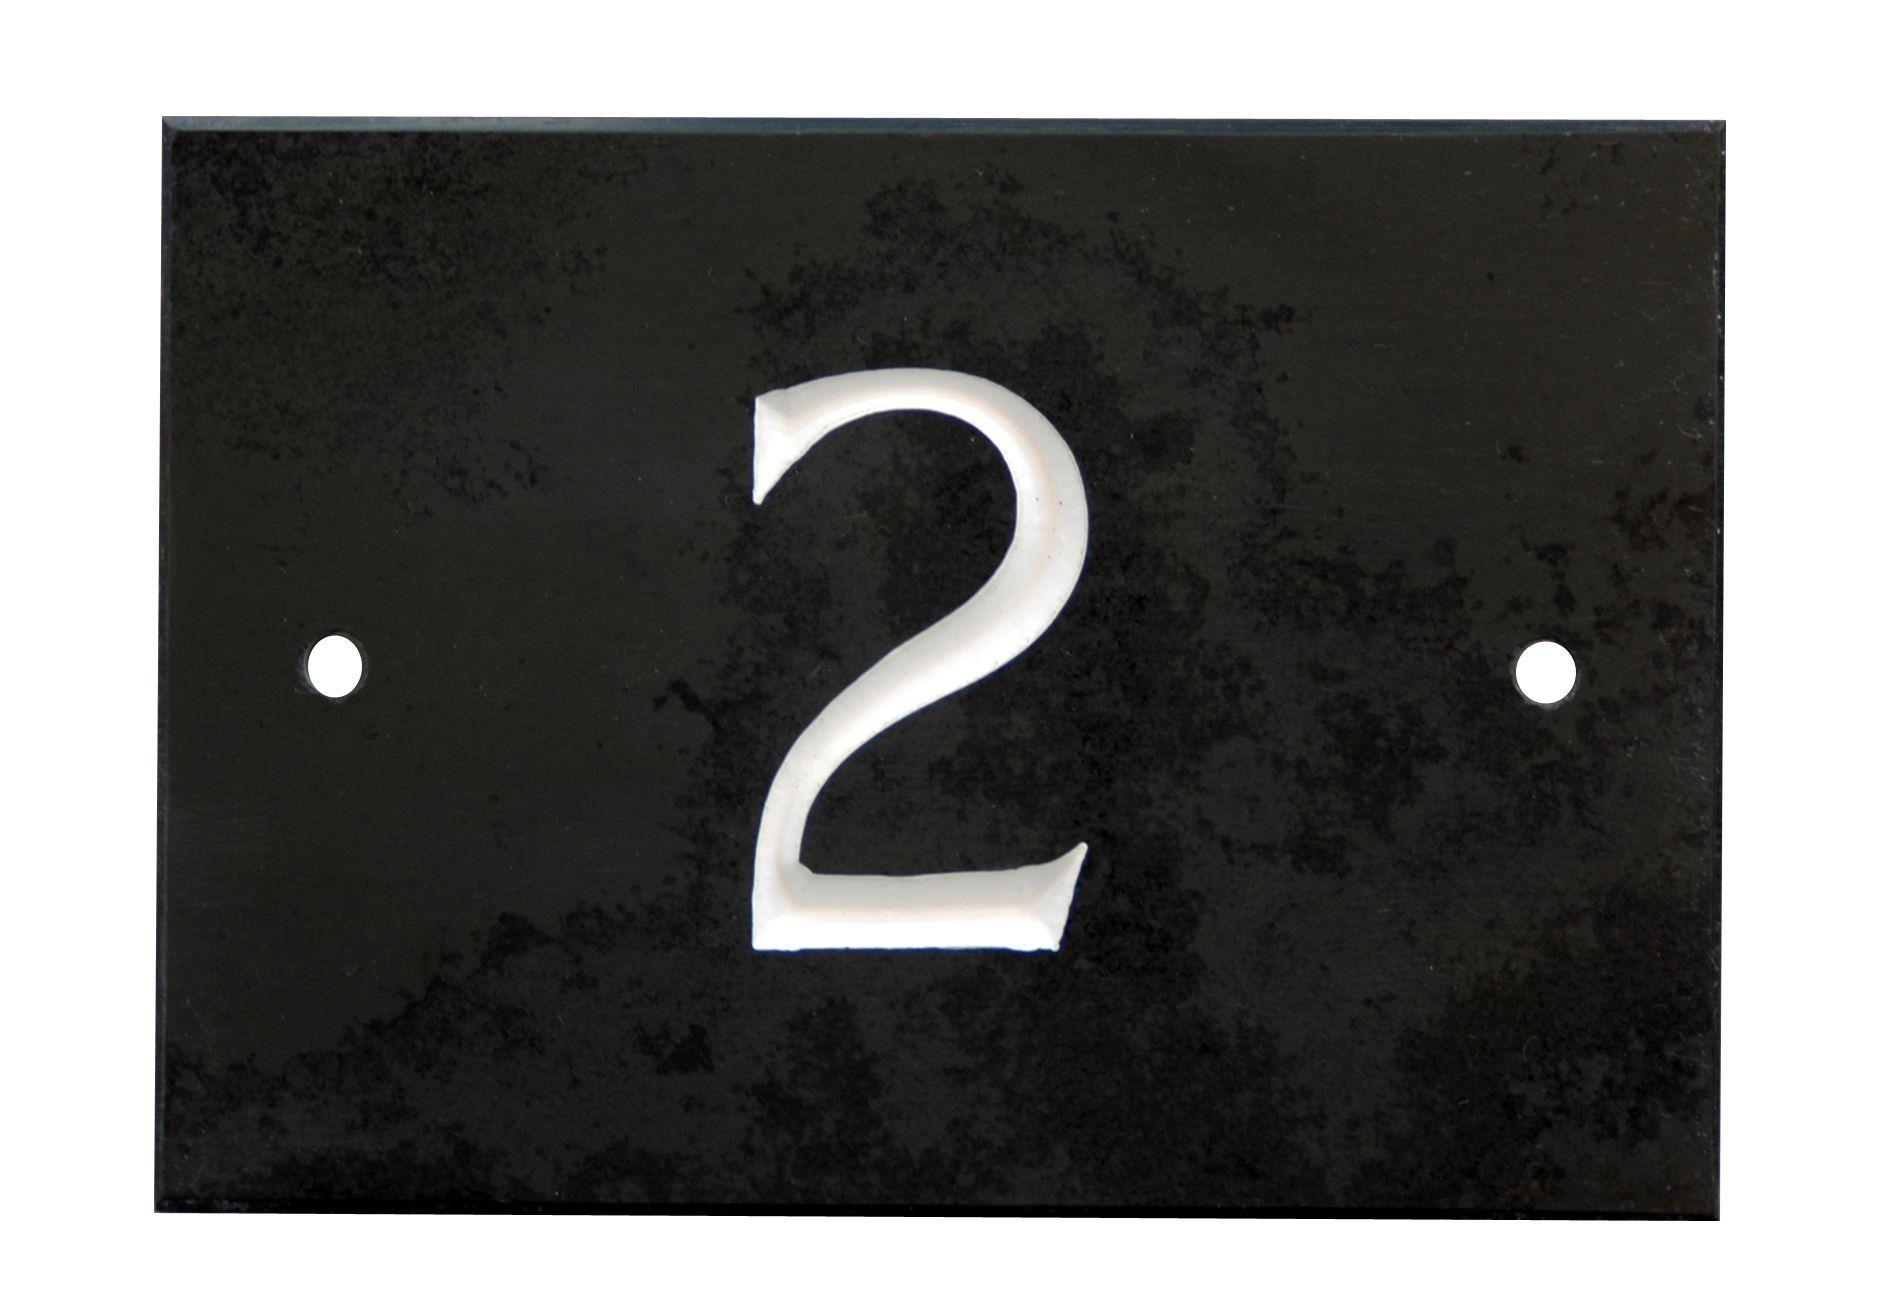 Black Slate Rectangle House Plate Number 2